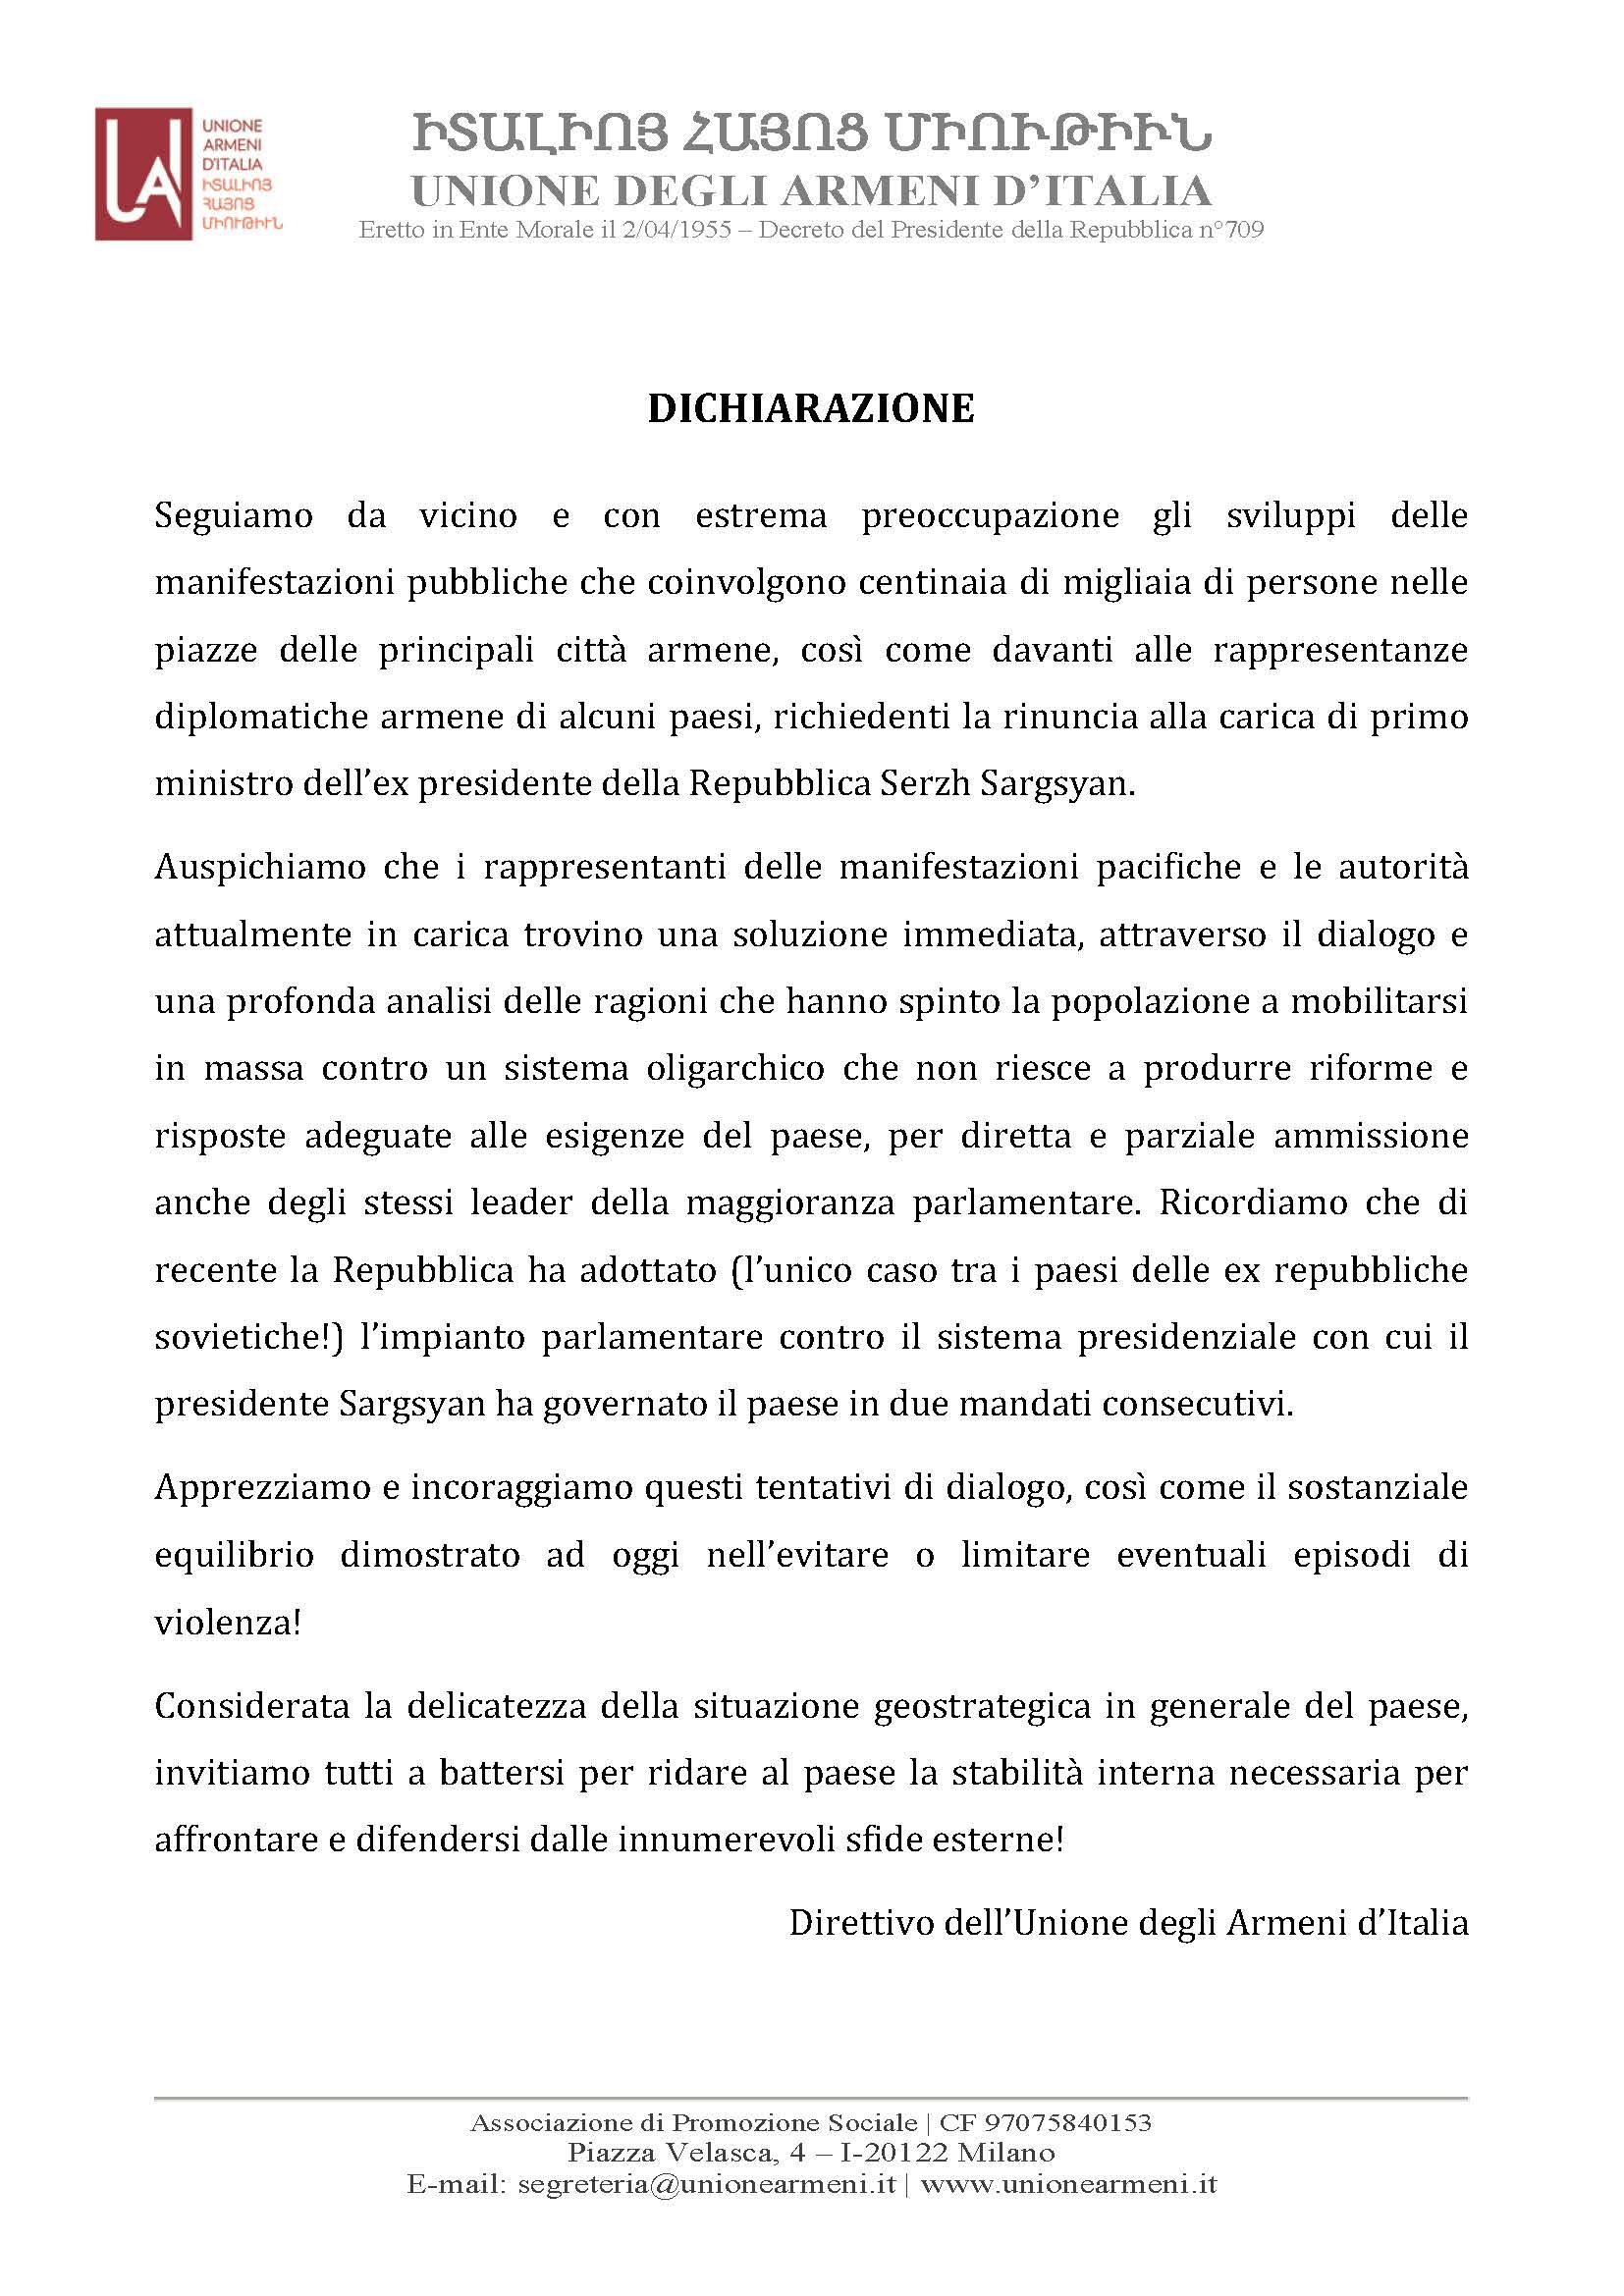 dichiarazione-uai